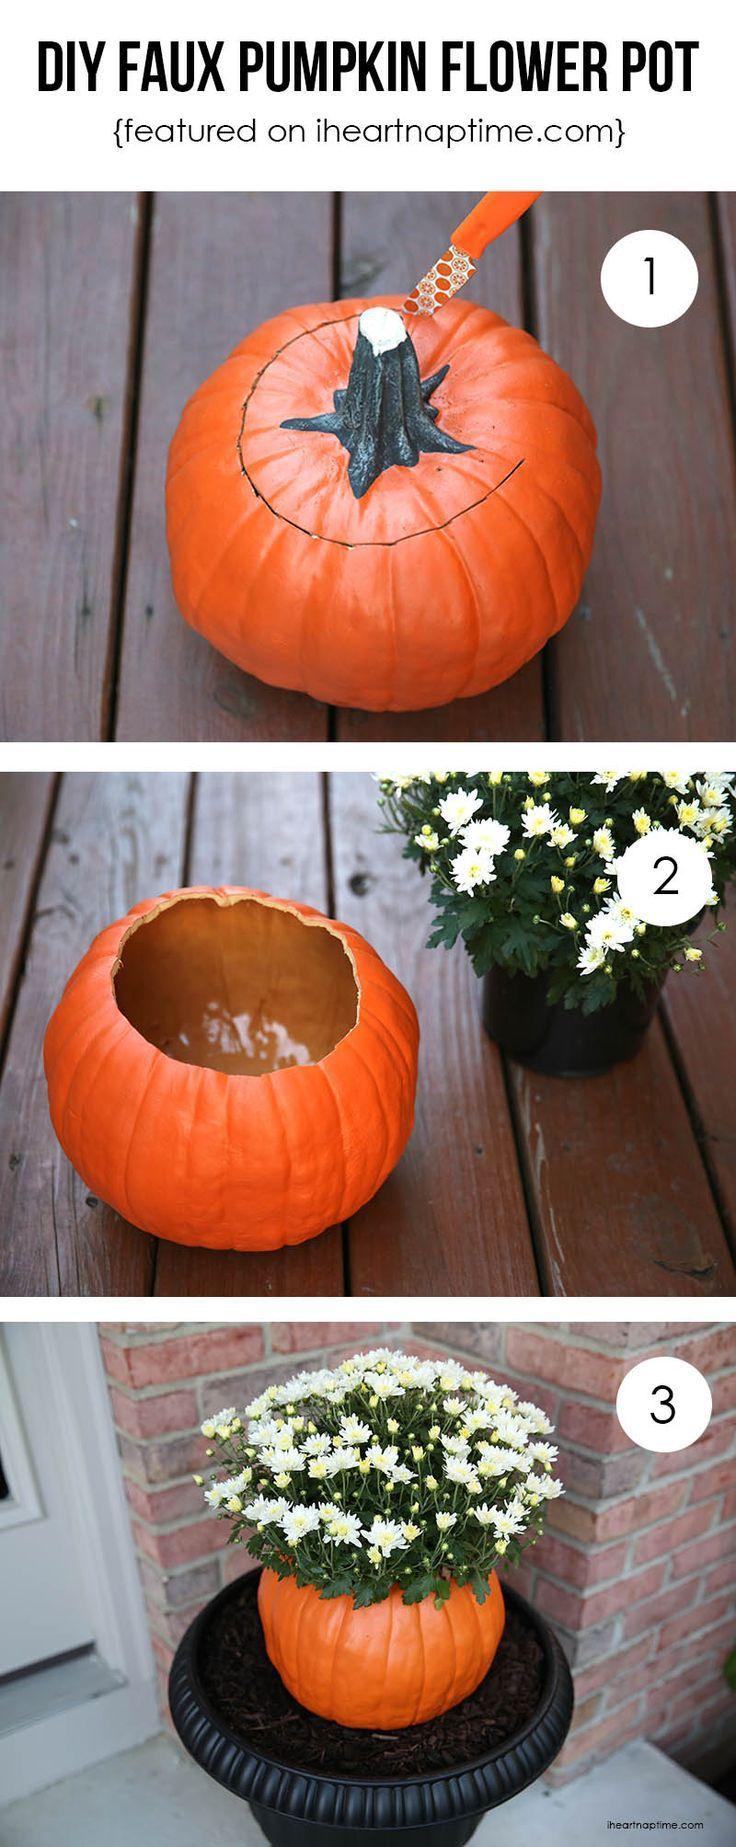 DIY Faux Pumpkin Flower Centerpiece: Pinterest Challenge from Occasionally Crafty